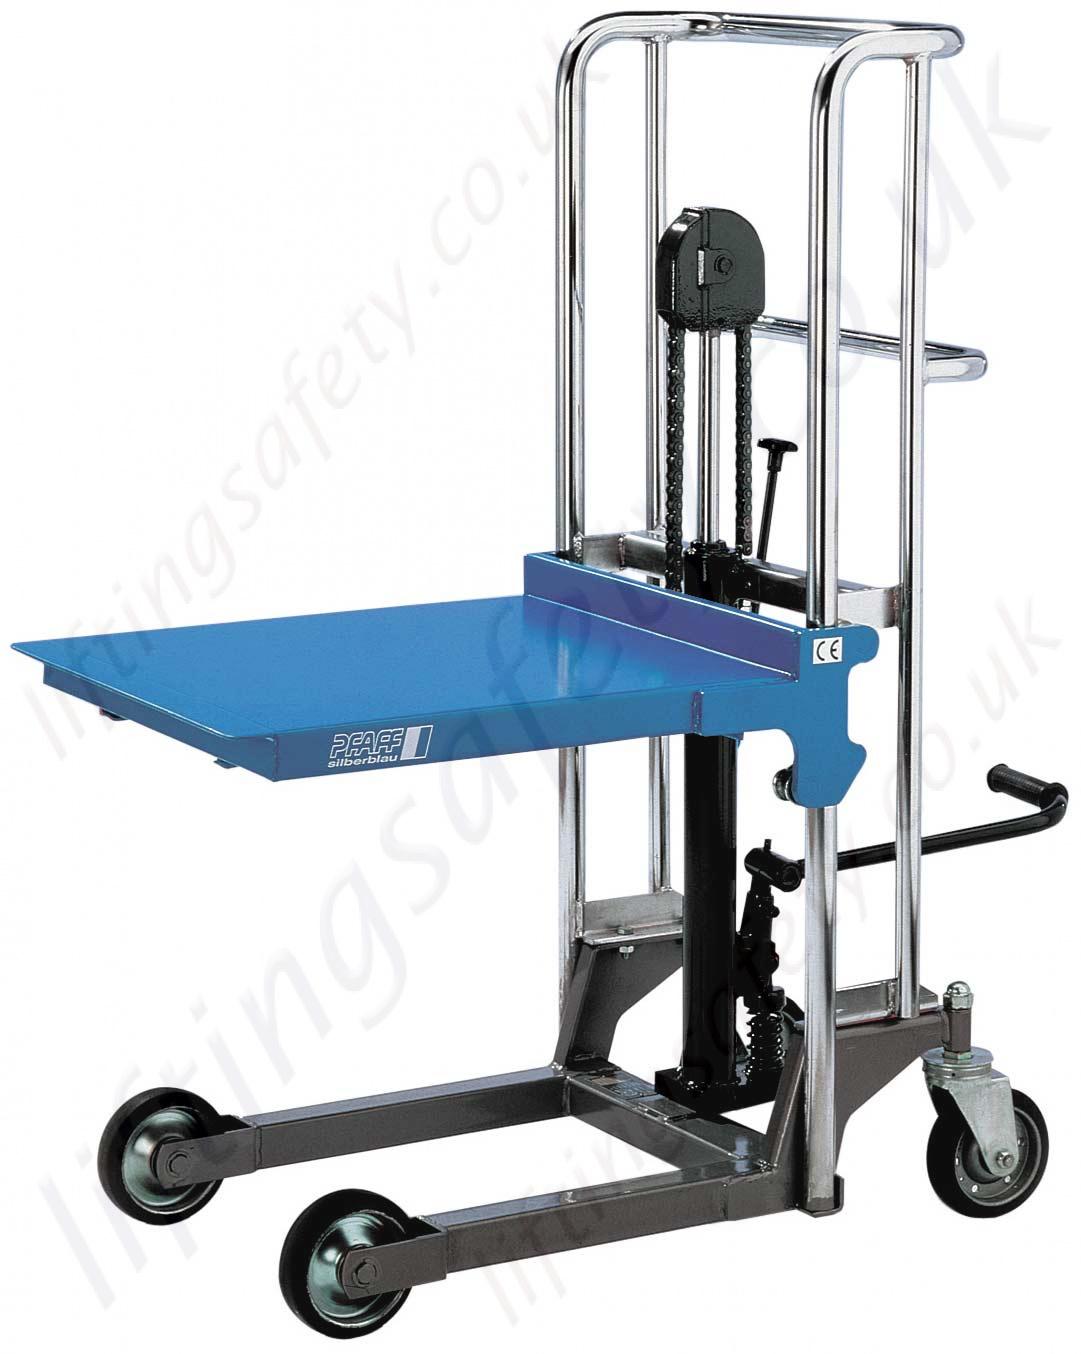 safe manual handling when lifting